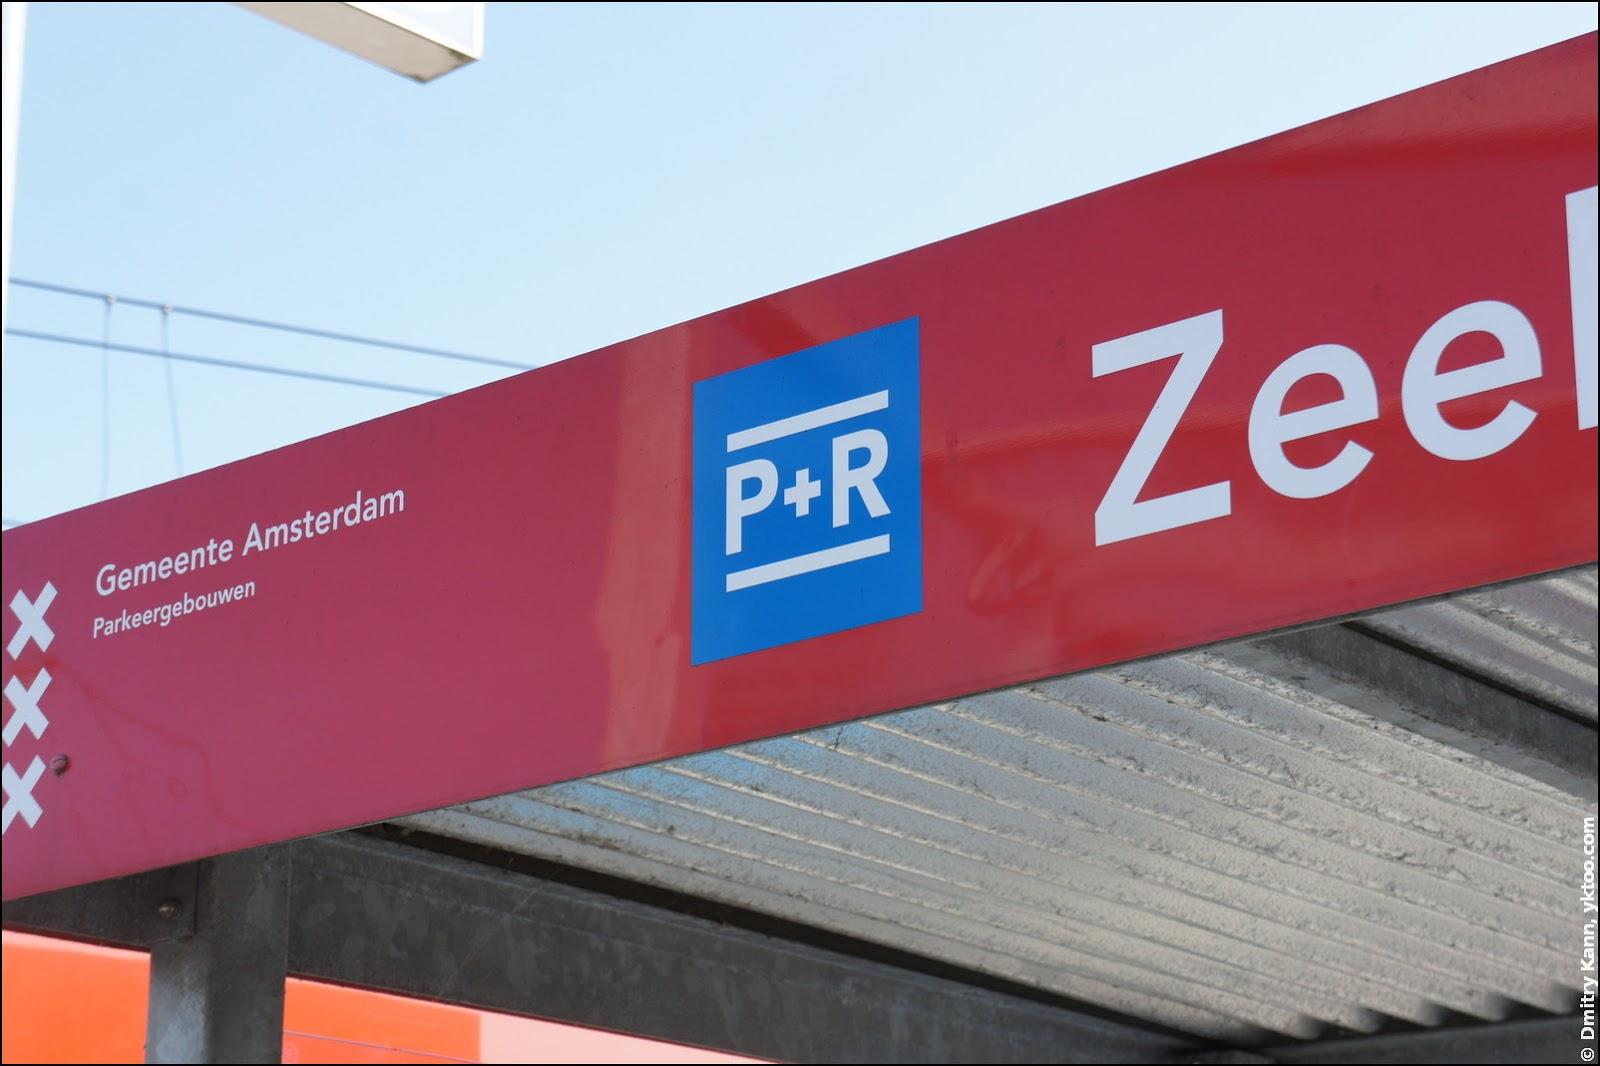 P+R Zeeburg.